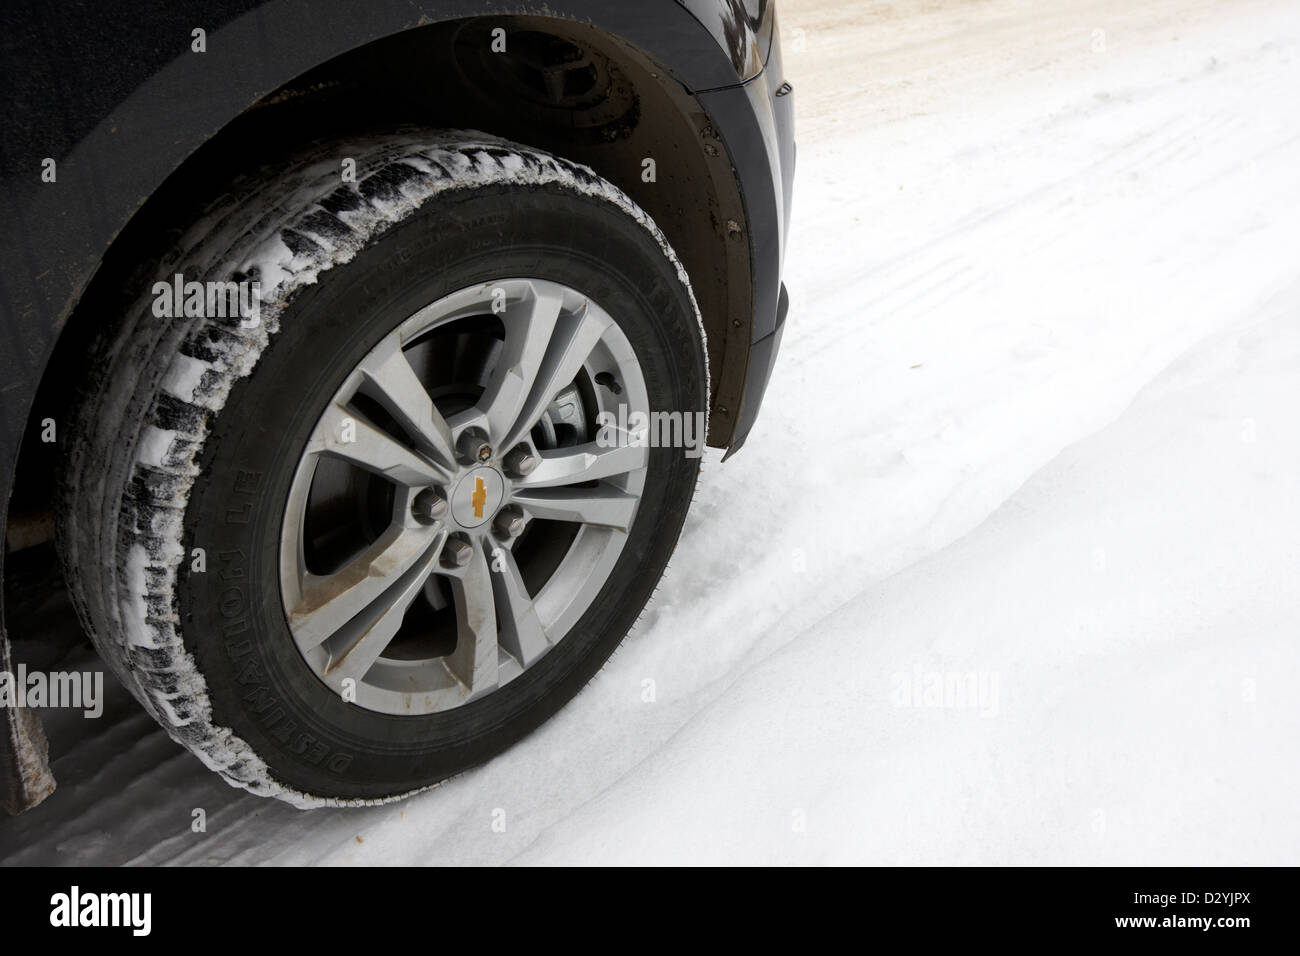 suv all weather car tire in the snow Saskatoon Saskatchewan Canada - Stock Image